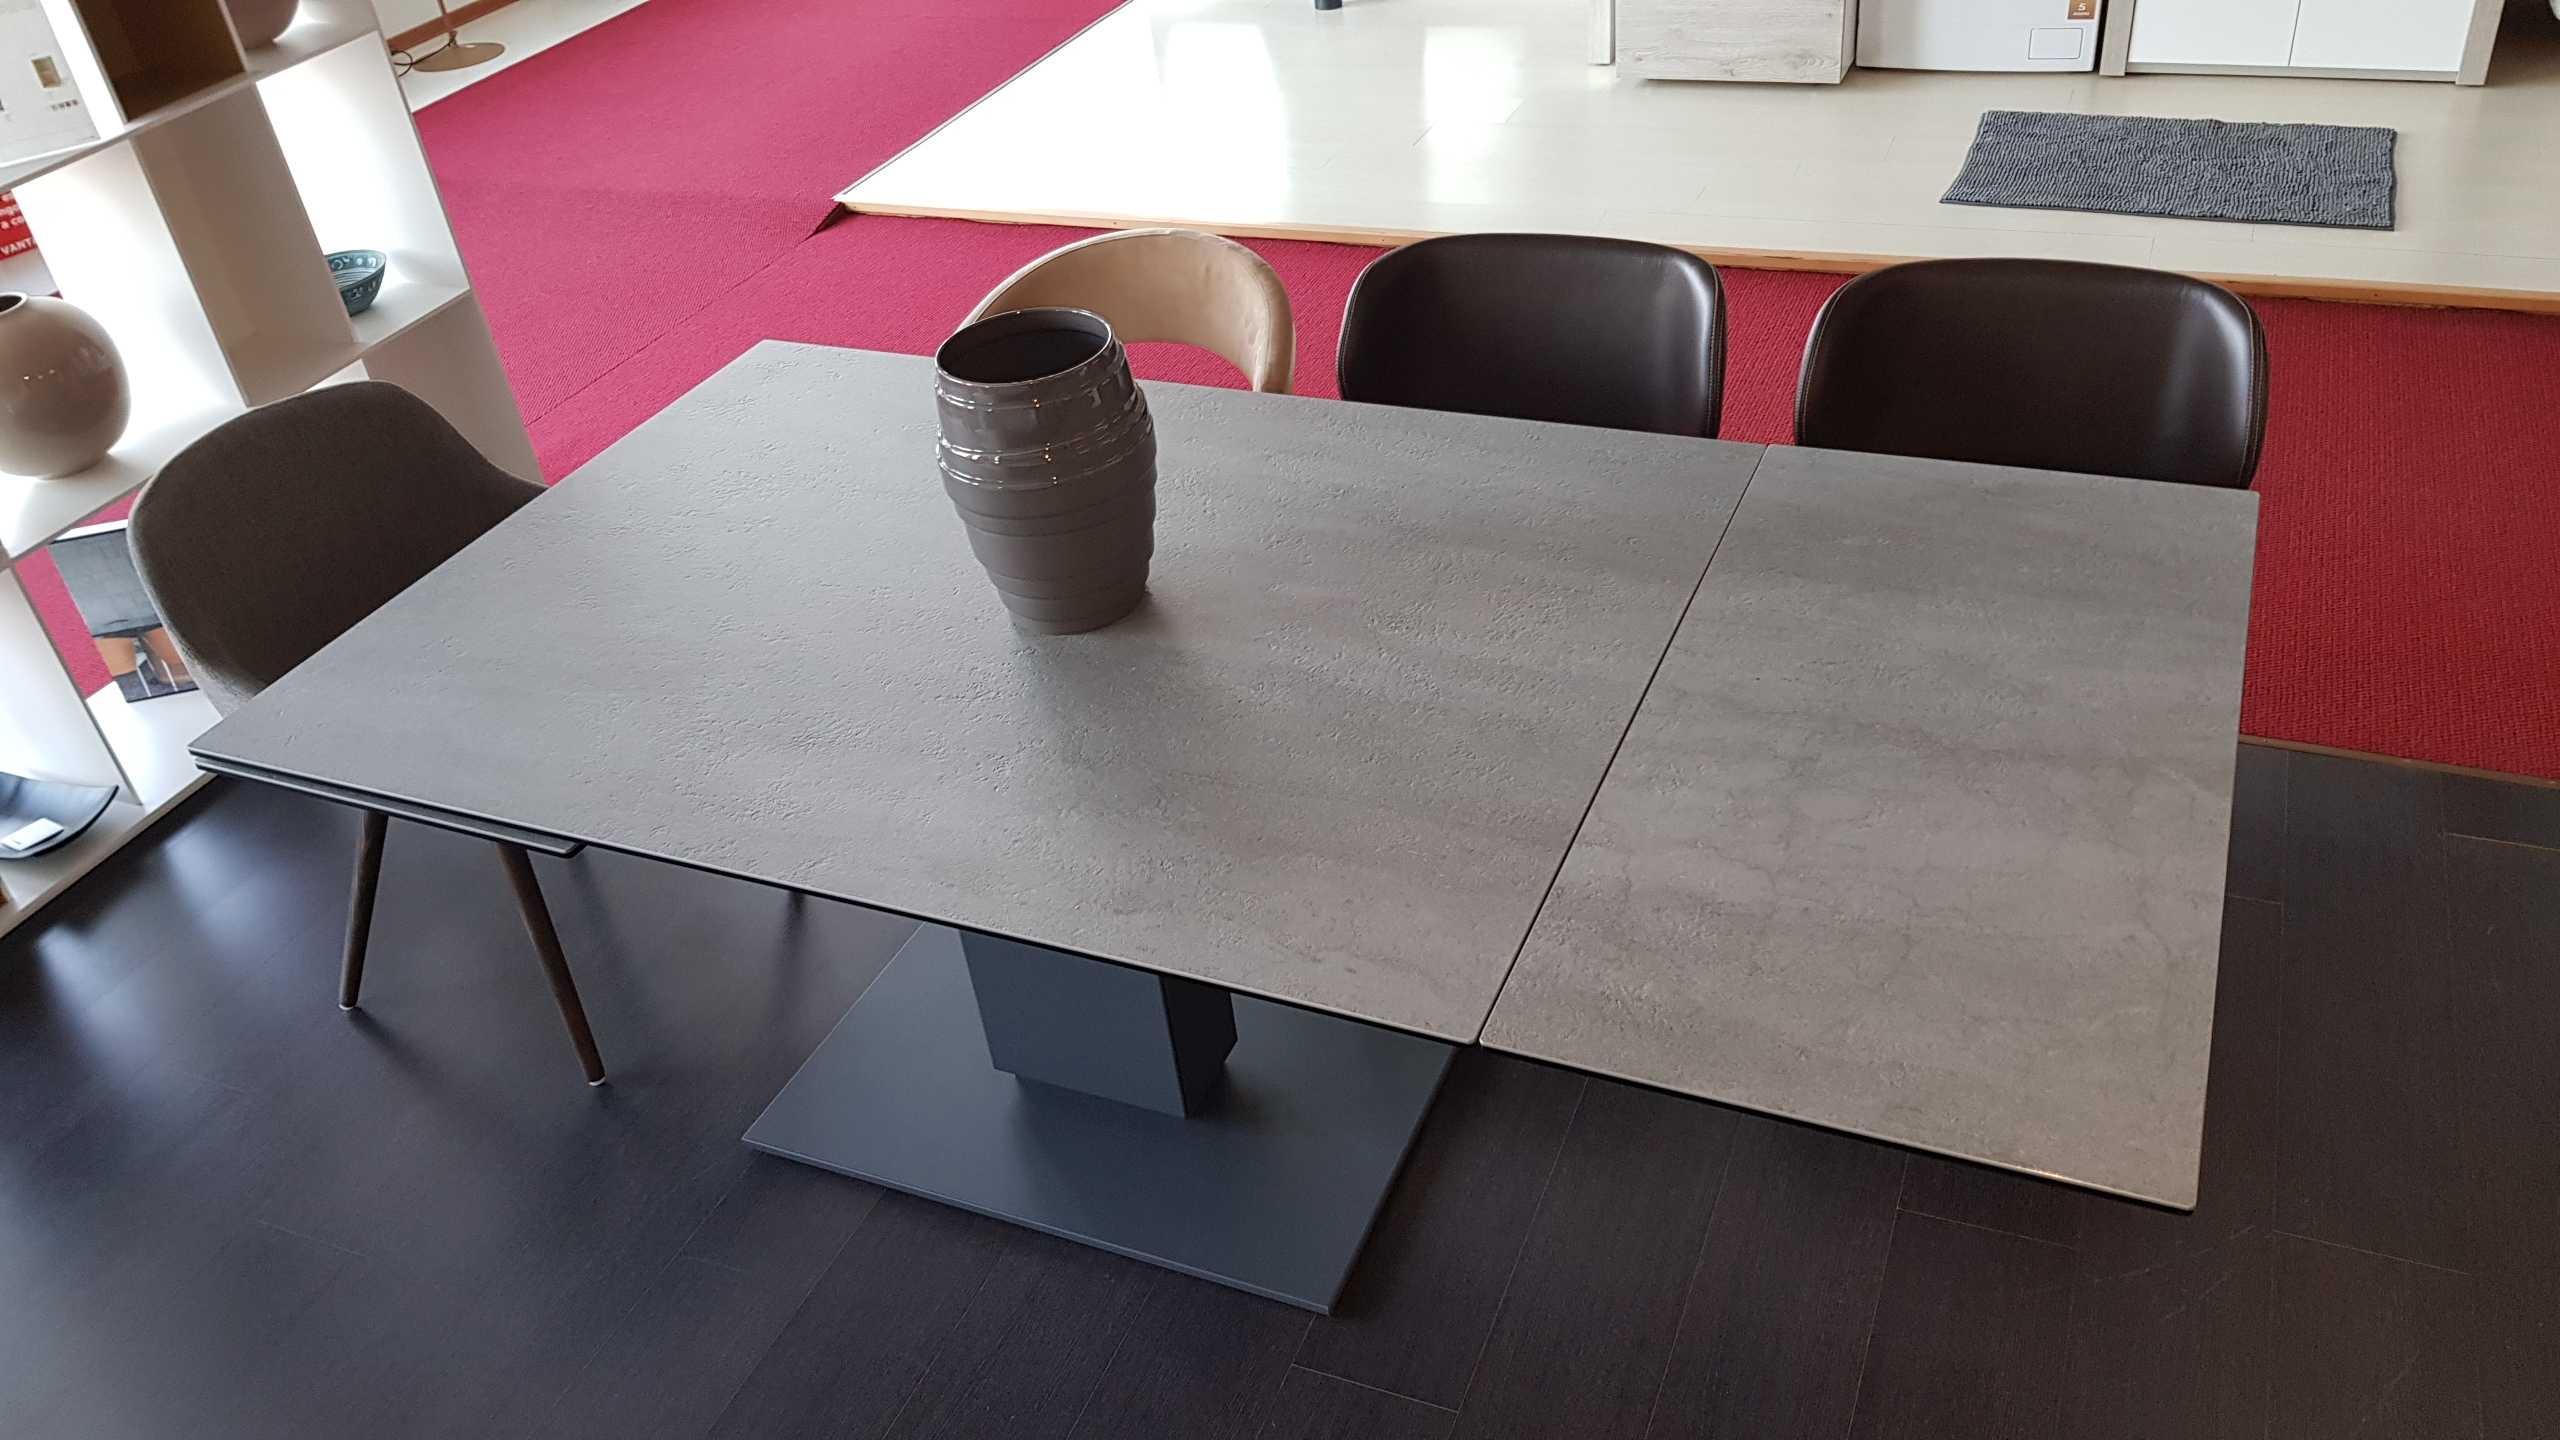 Outlet tavolo calligaris echo in ceramica cemento tavoli for Tavolo cemento calligaris